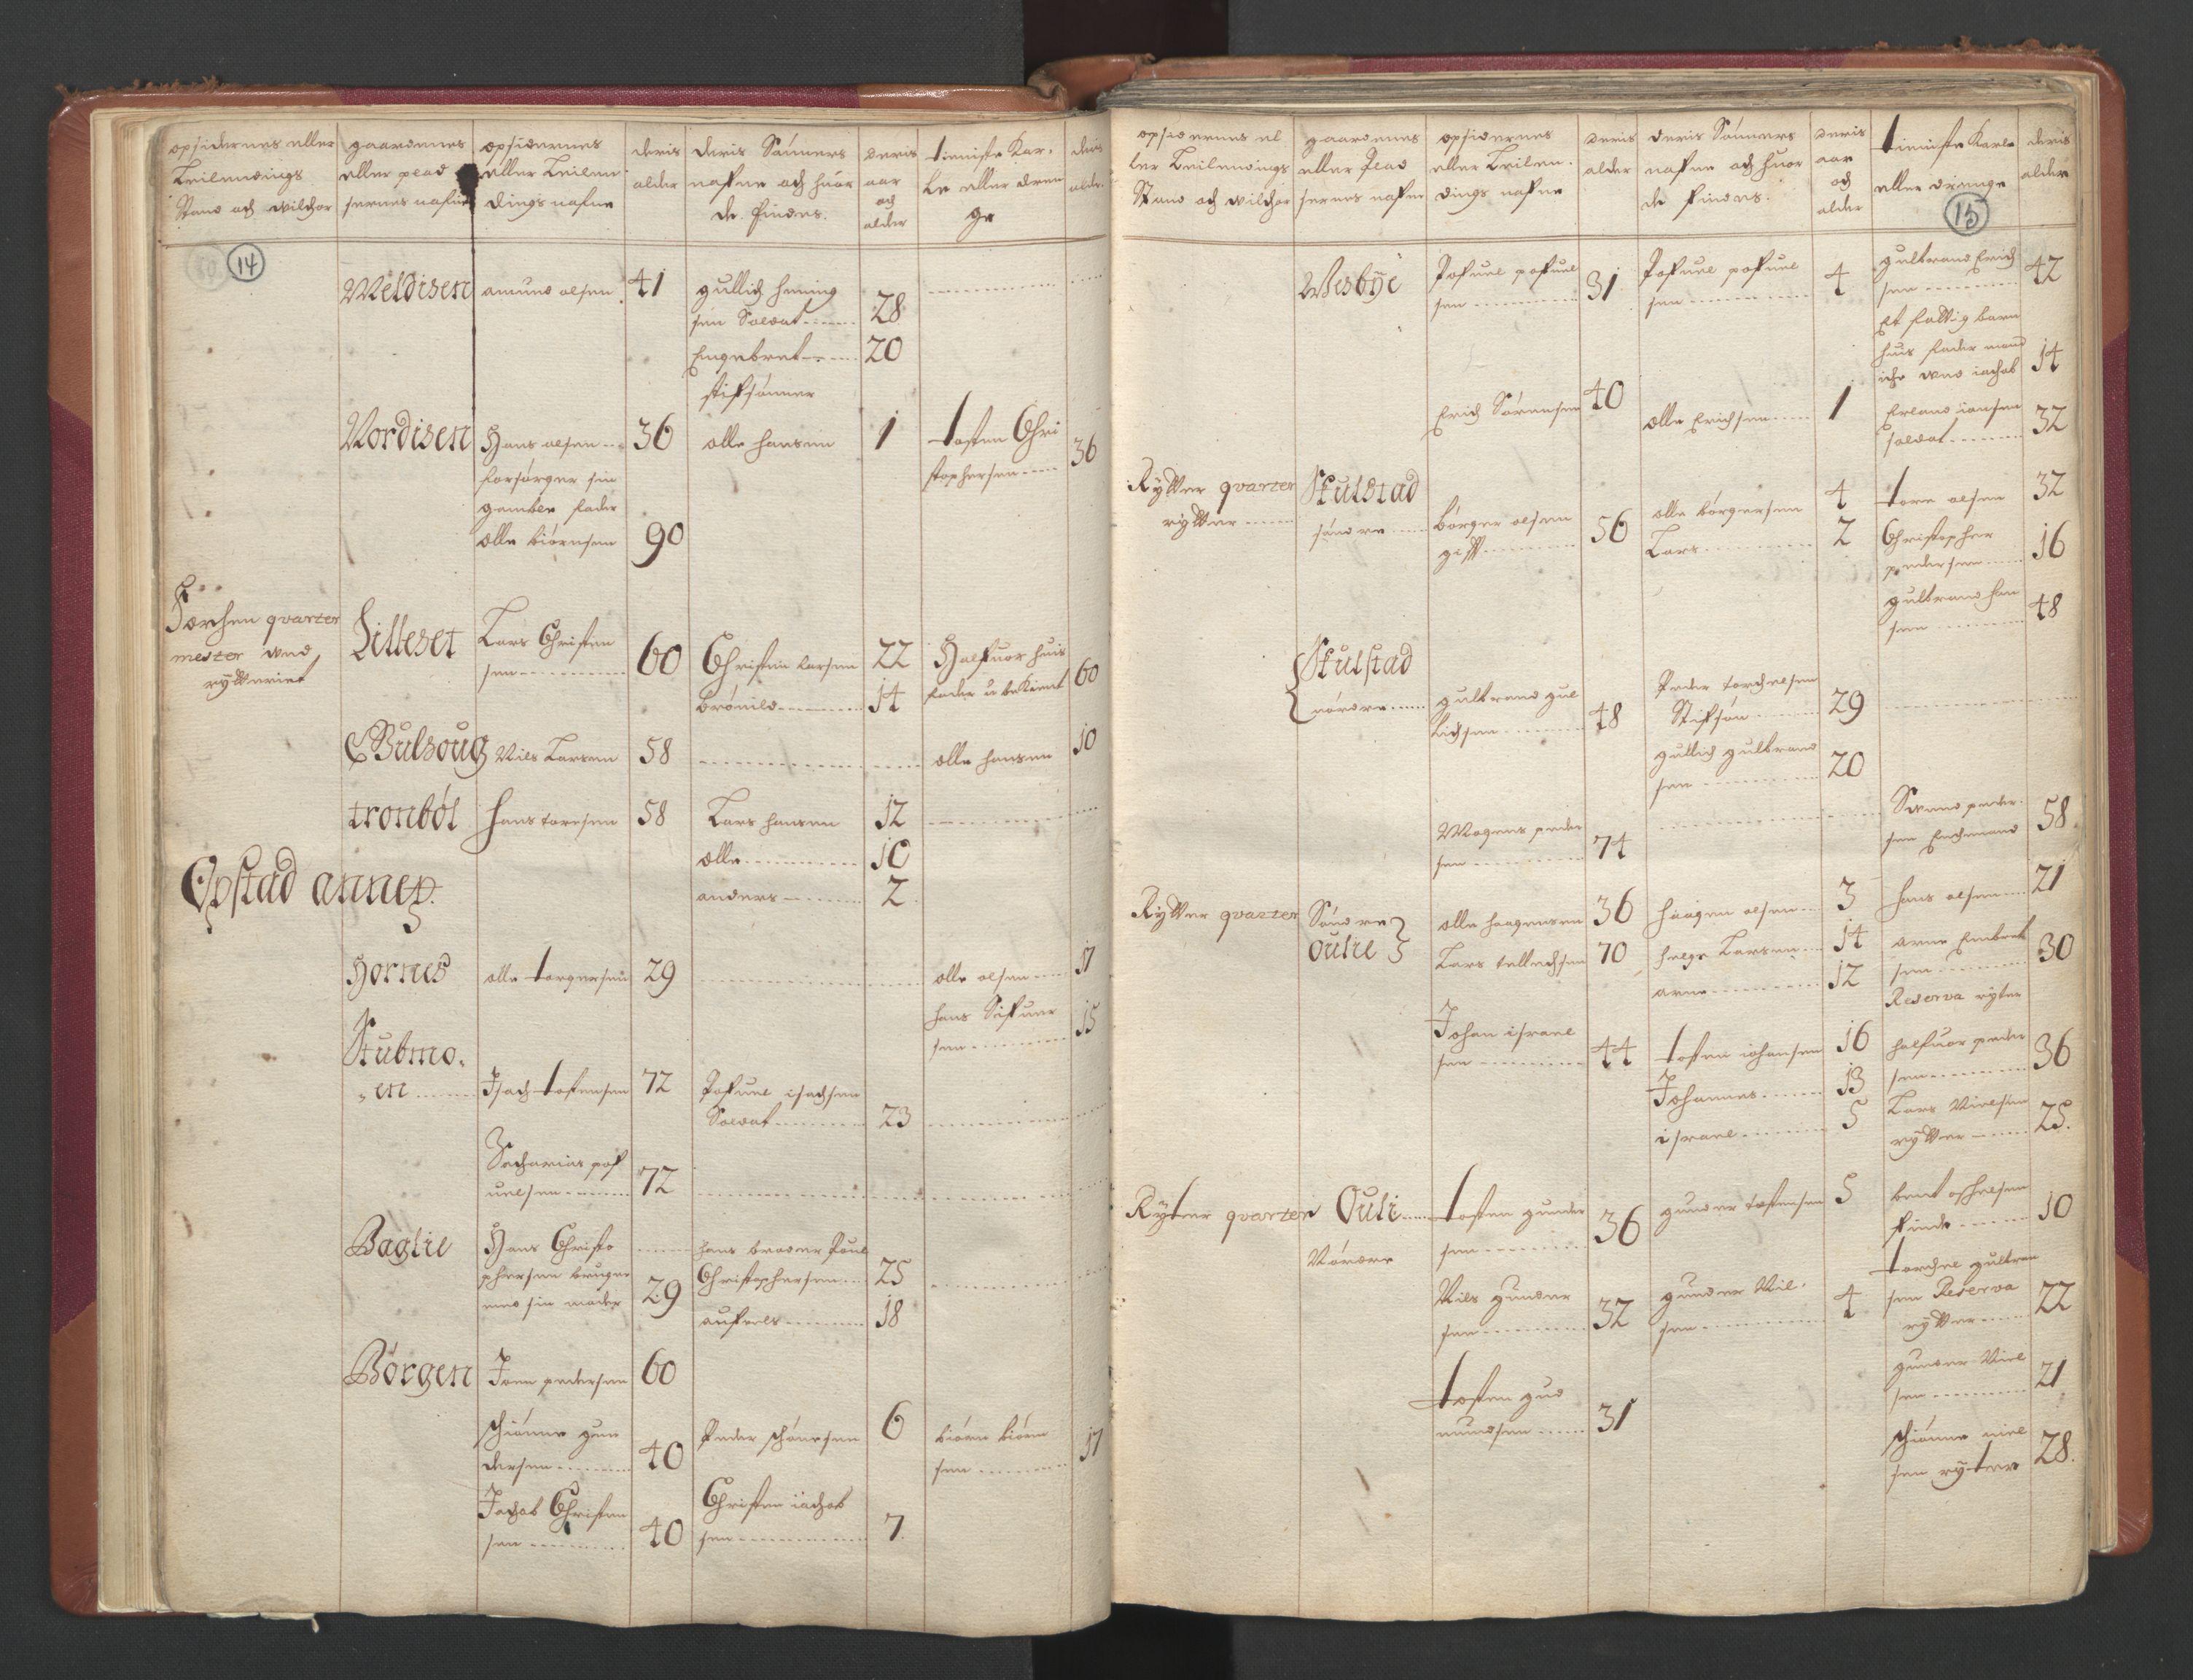 RA, Manntallet 1701, nr. 2: Solør, Odal og Østerdal fogderi og Larvik grevskap, 1701, s. 14-15